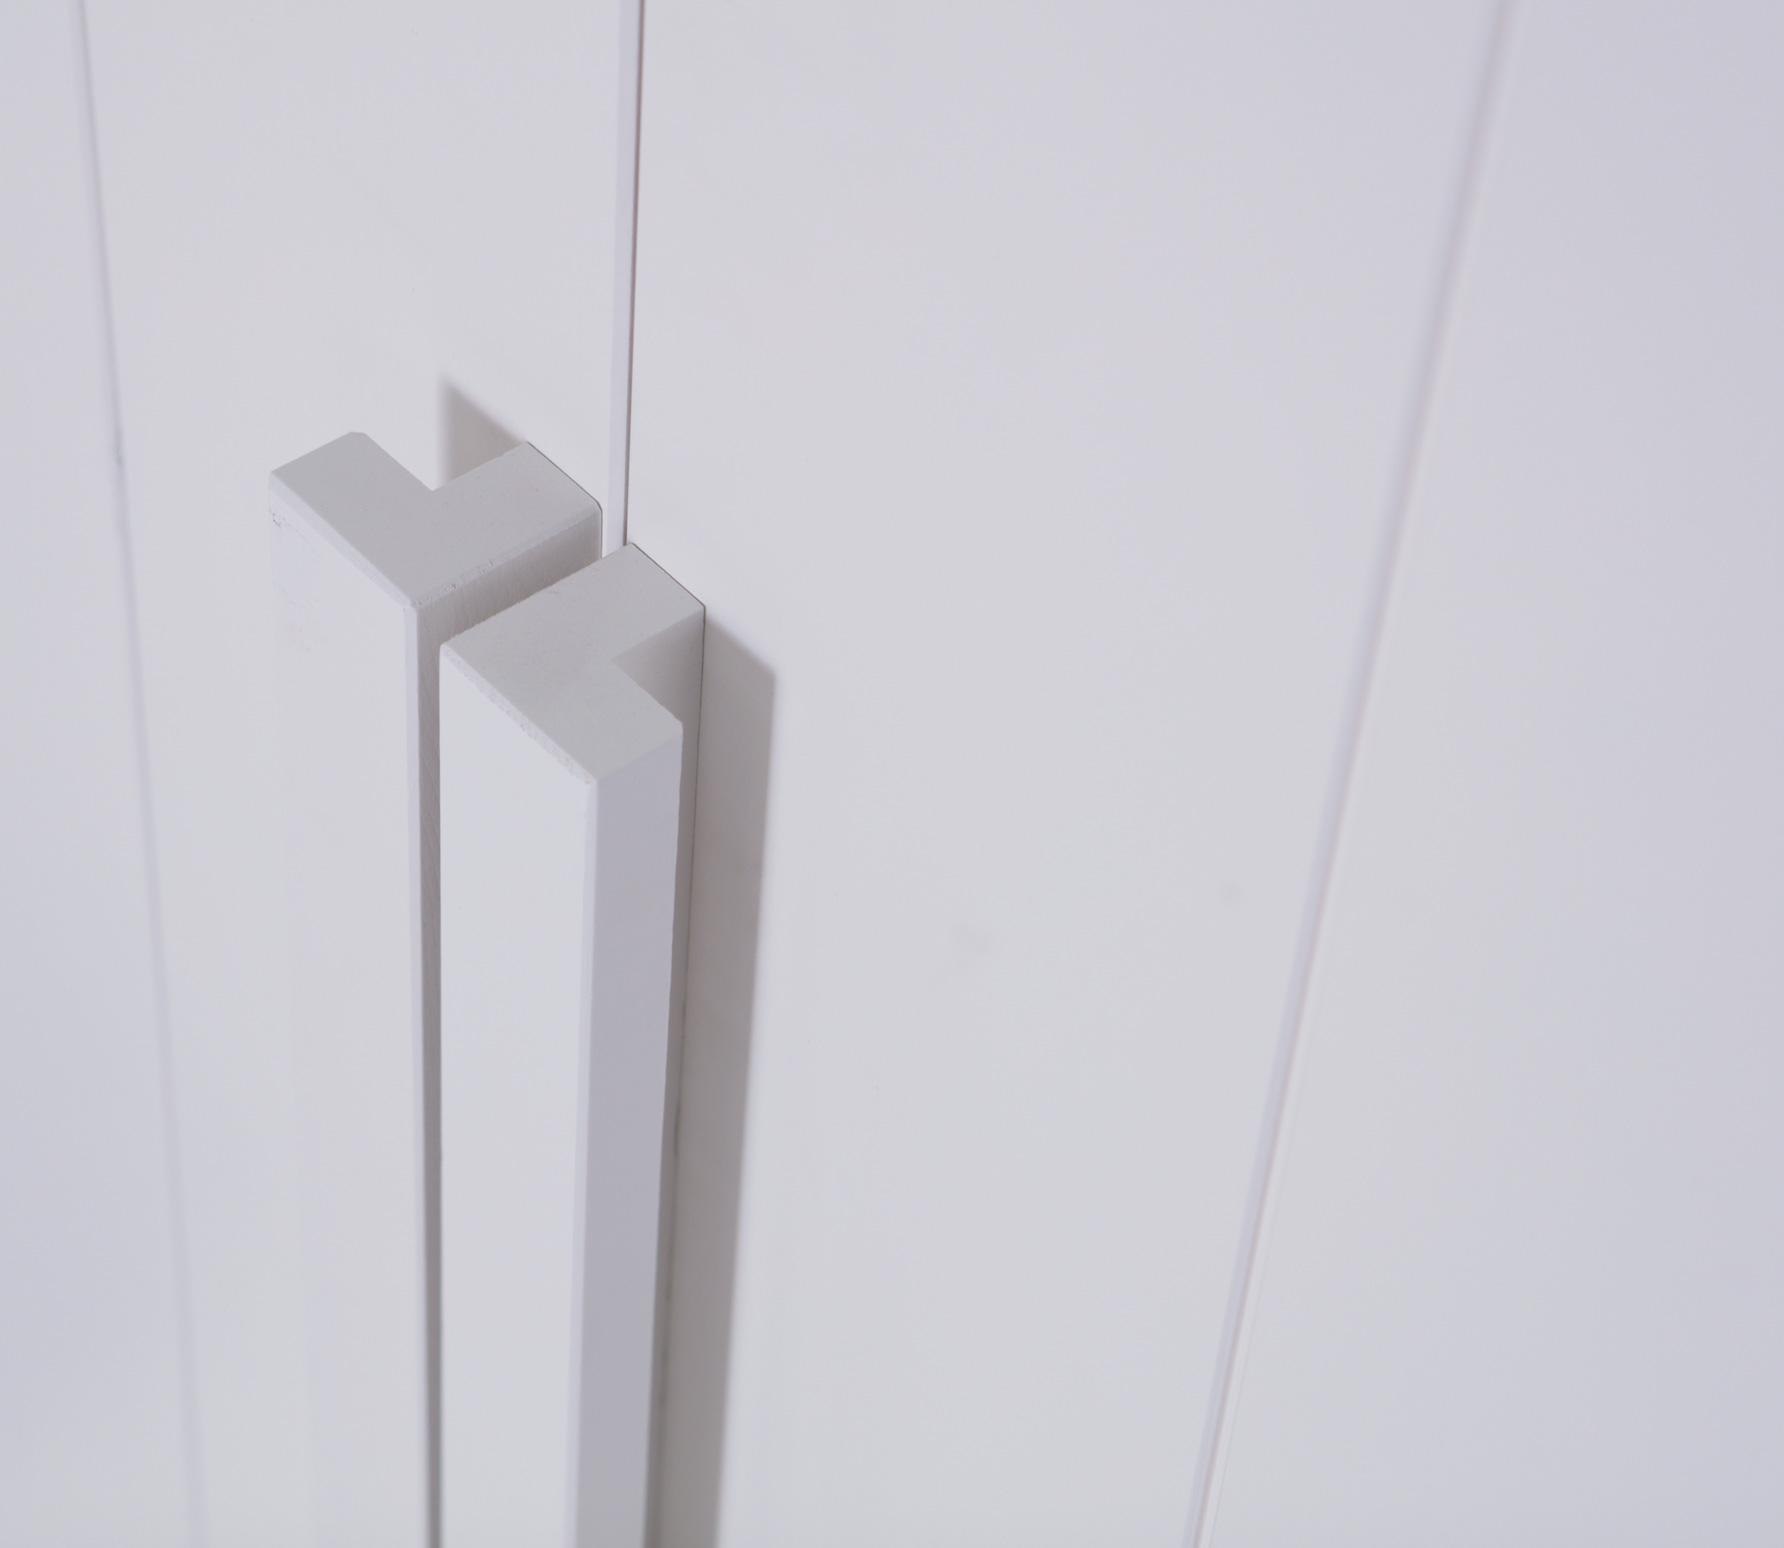 Basiclabel SKIK kast variant 14 231x95x62 cm grenen wit